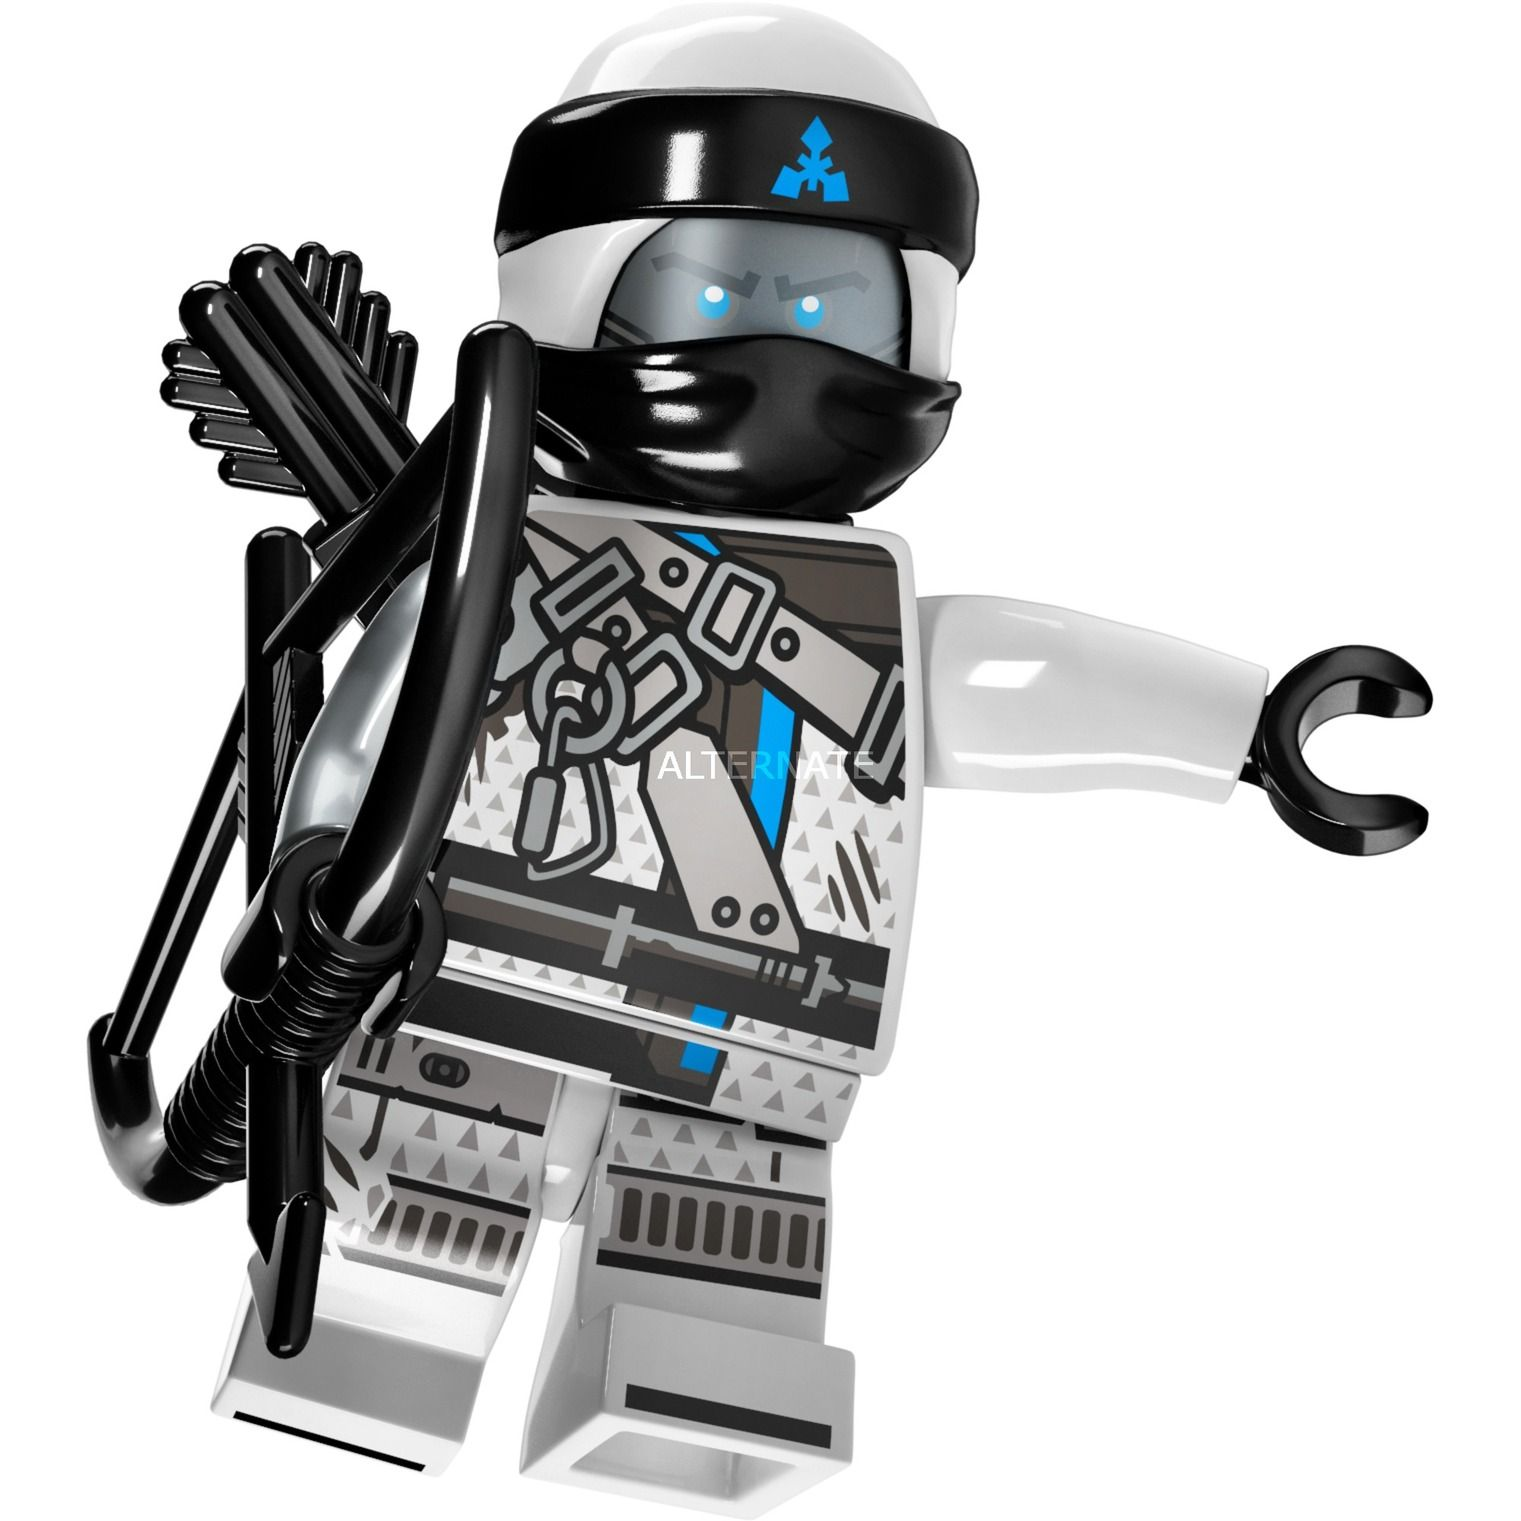 Pin By Graciela Morales On Kekollo Lego Ninjago Lego Ninjago